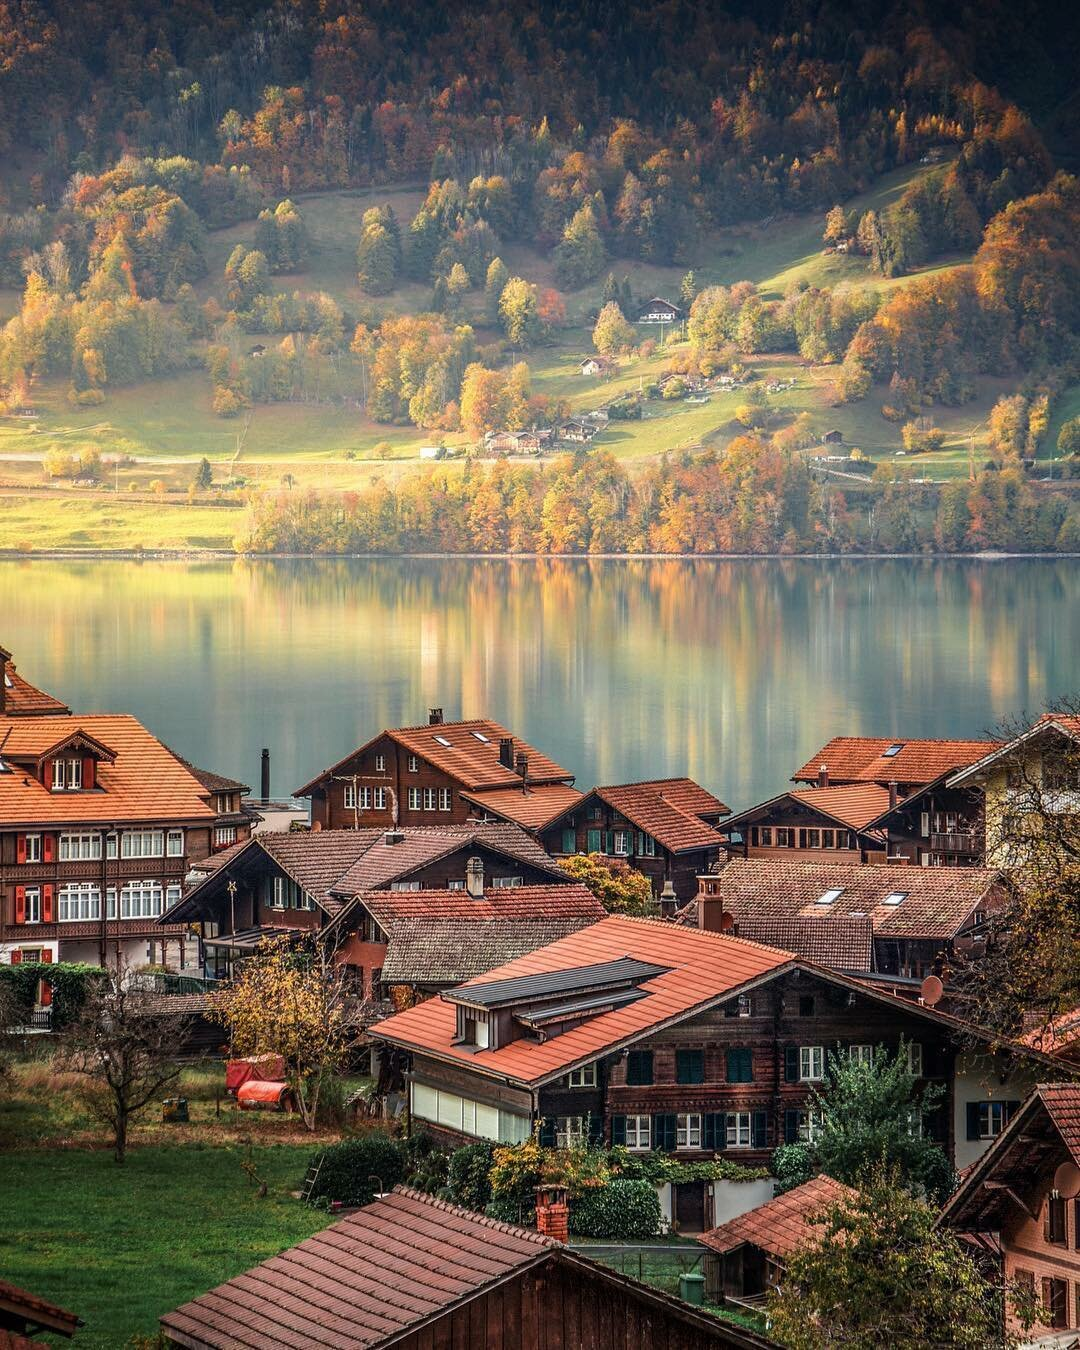 Швейцария картинки красивые, картинки приколы открытка